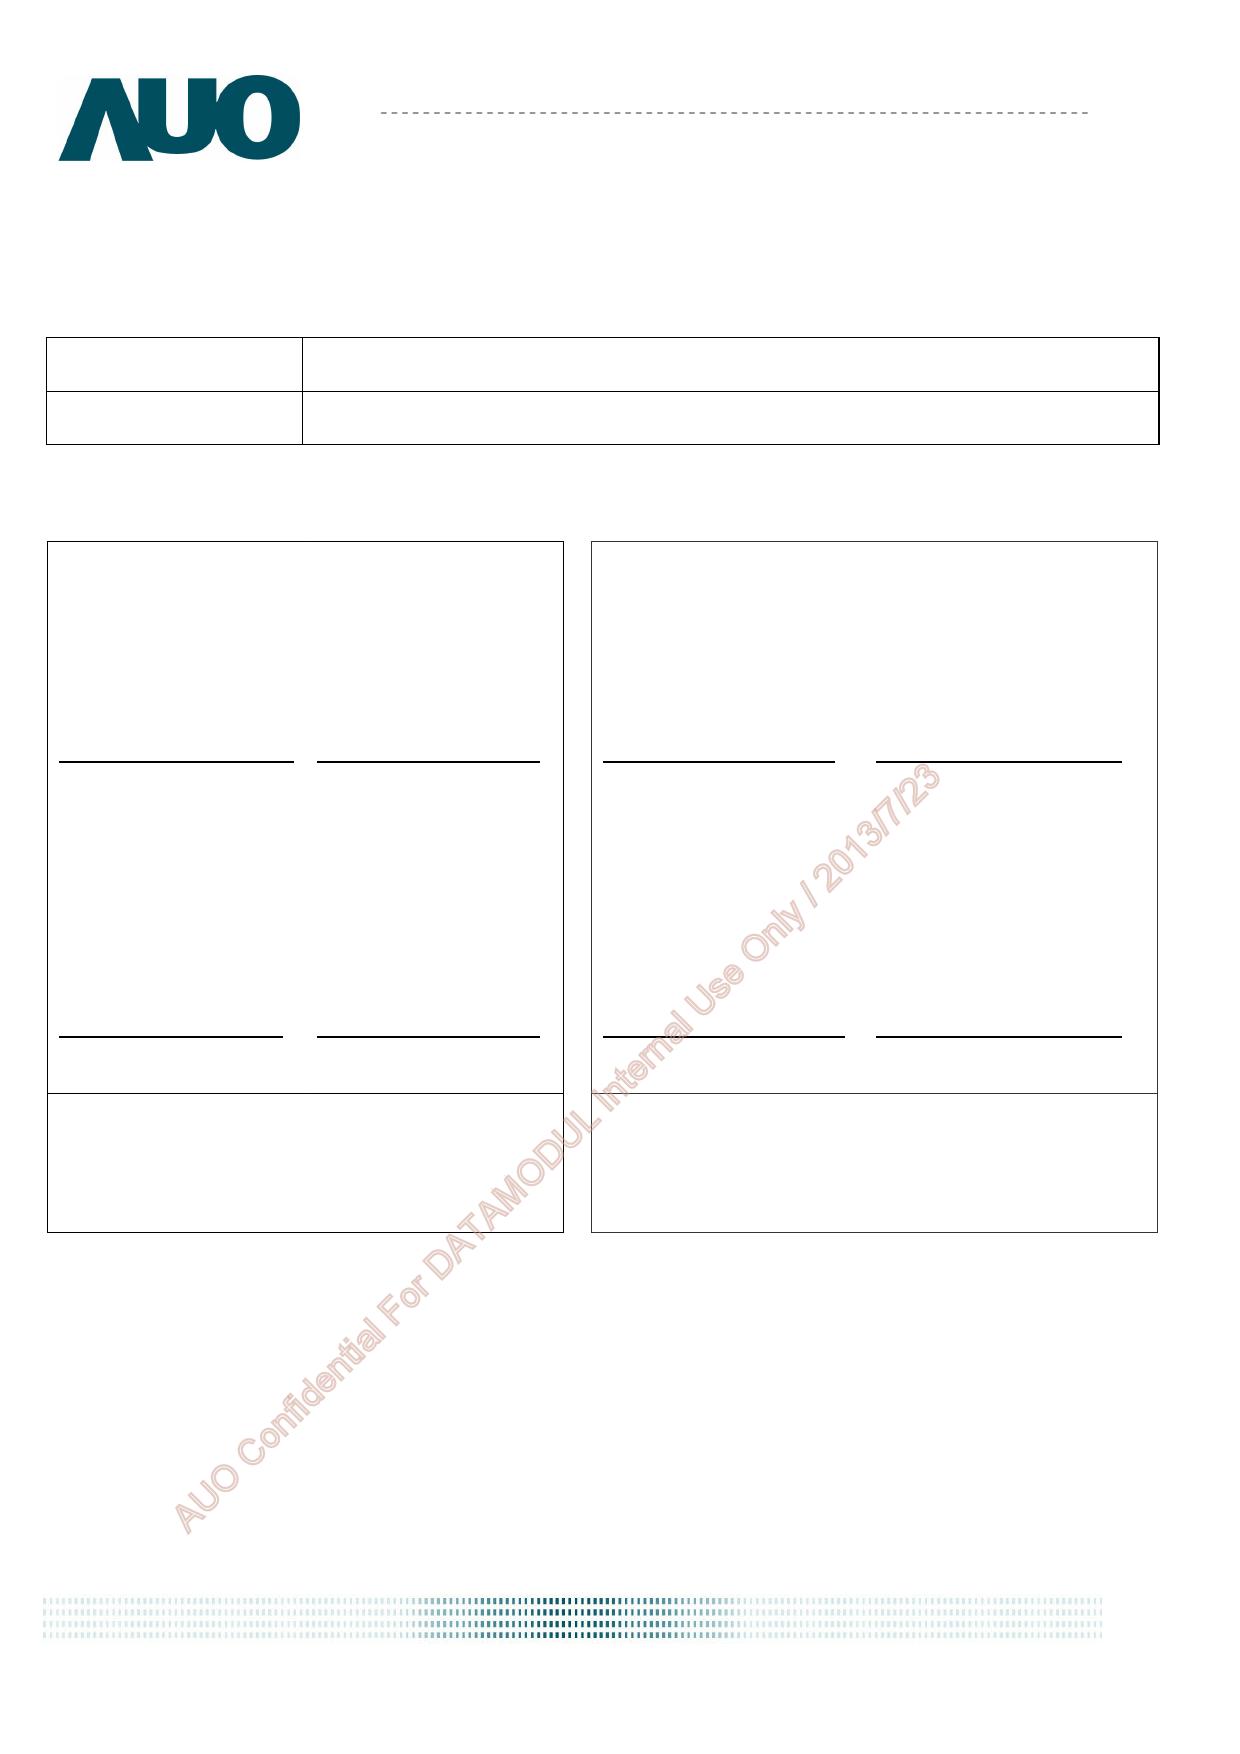 G043FW01-V0 دیتاشیت PDF